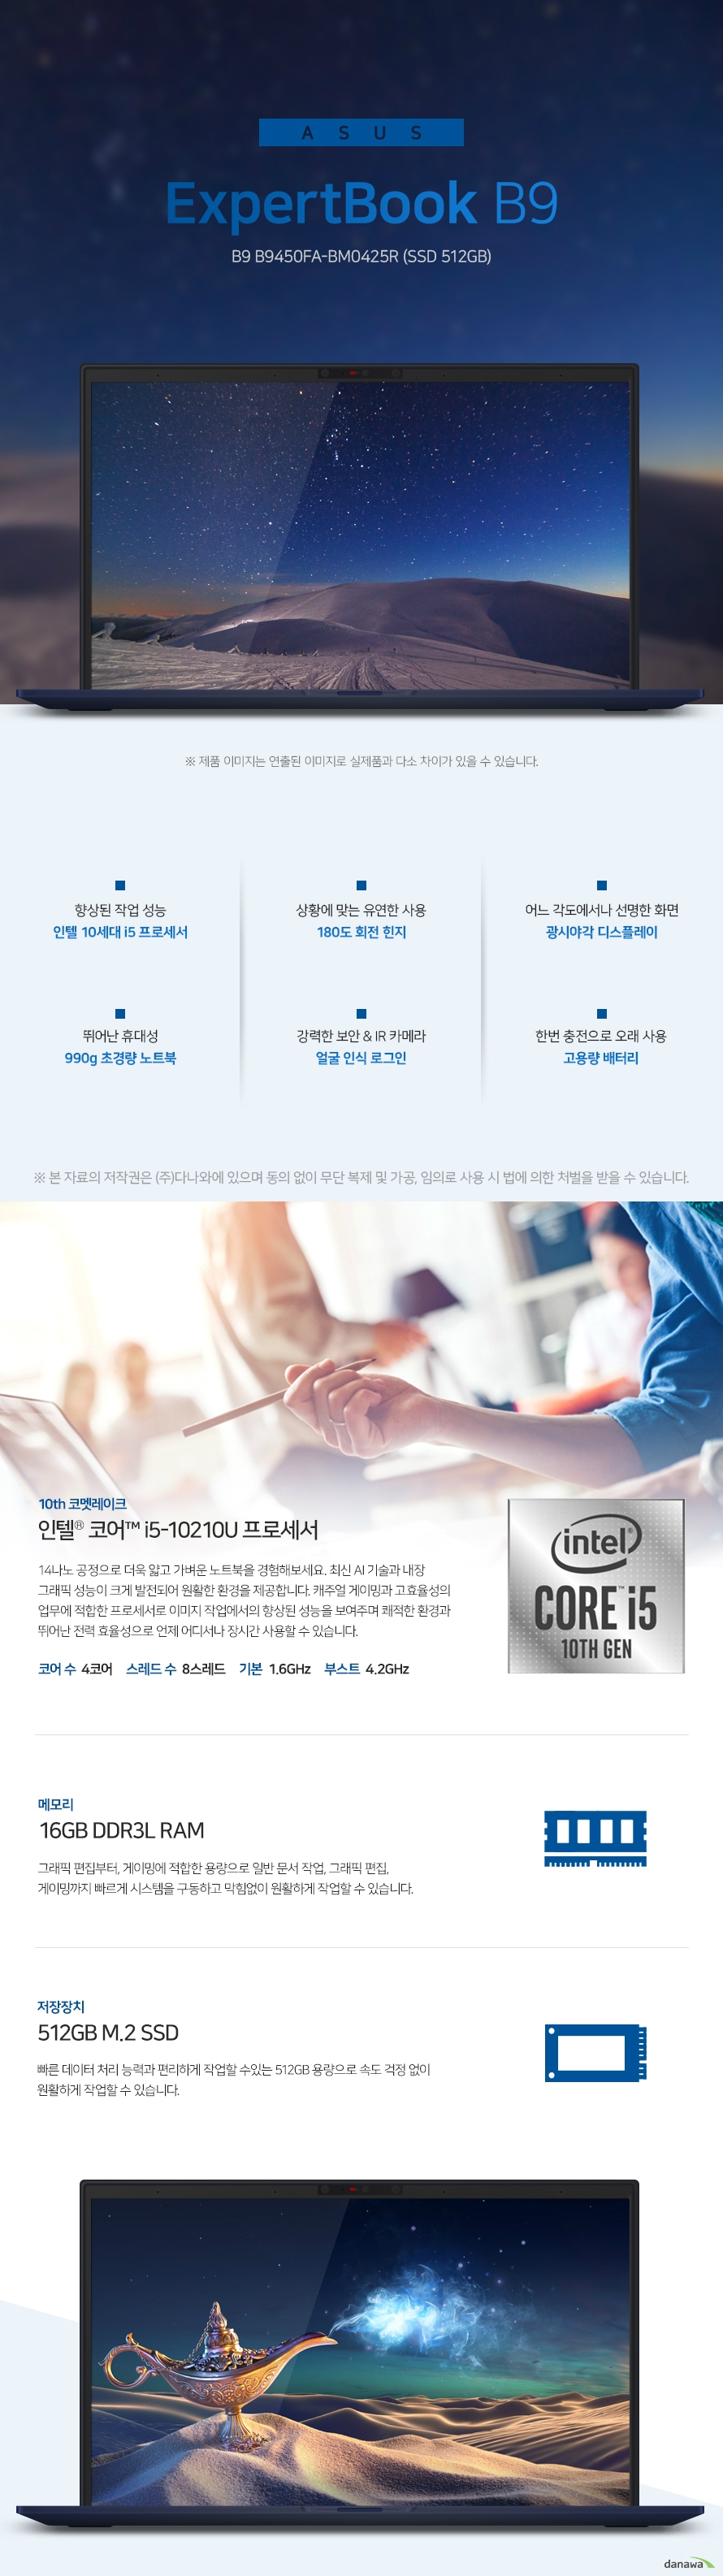 ASUS ExpertBook B9 B9450FA-BM0425R (SSD 512GB)